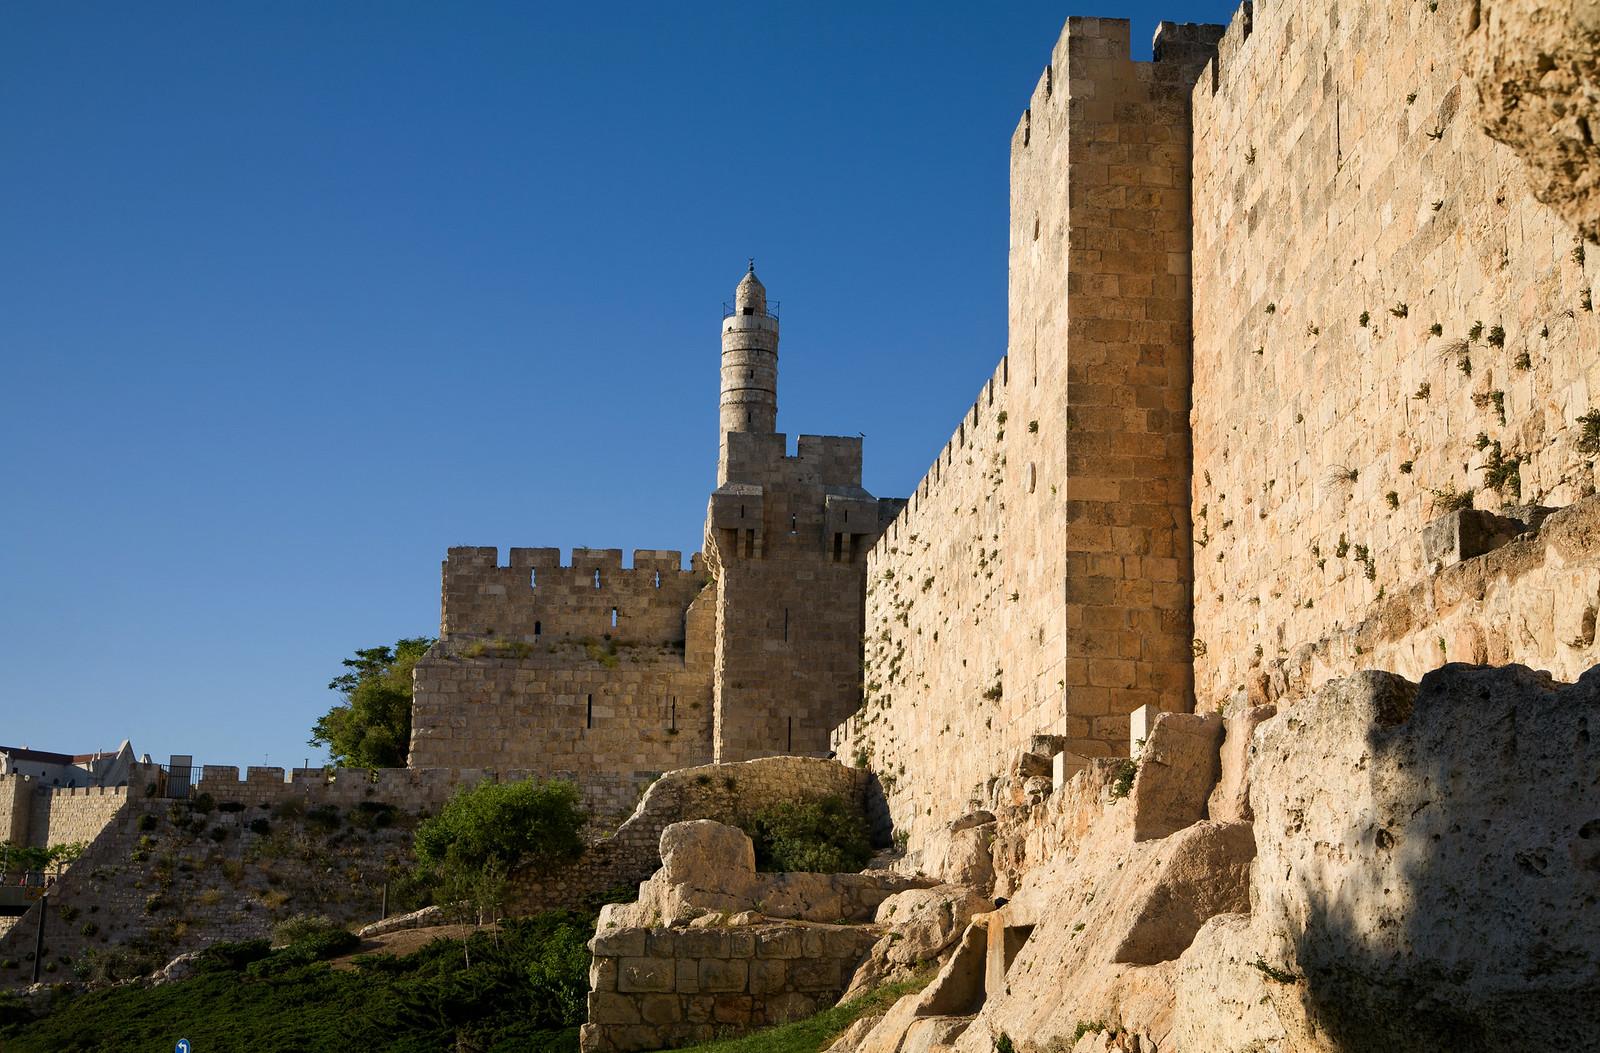 Jerusalem_The Tower of David_6_Noam Chen_IMOT